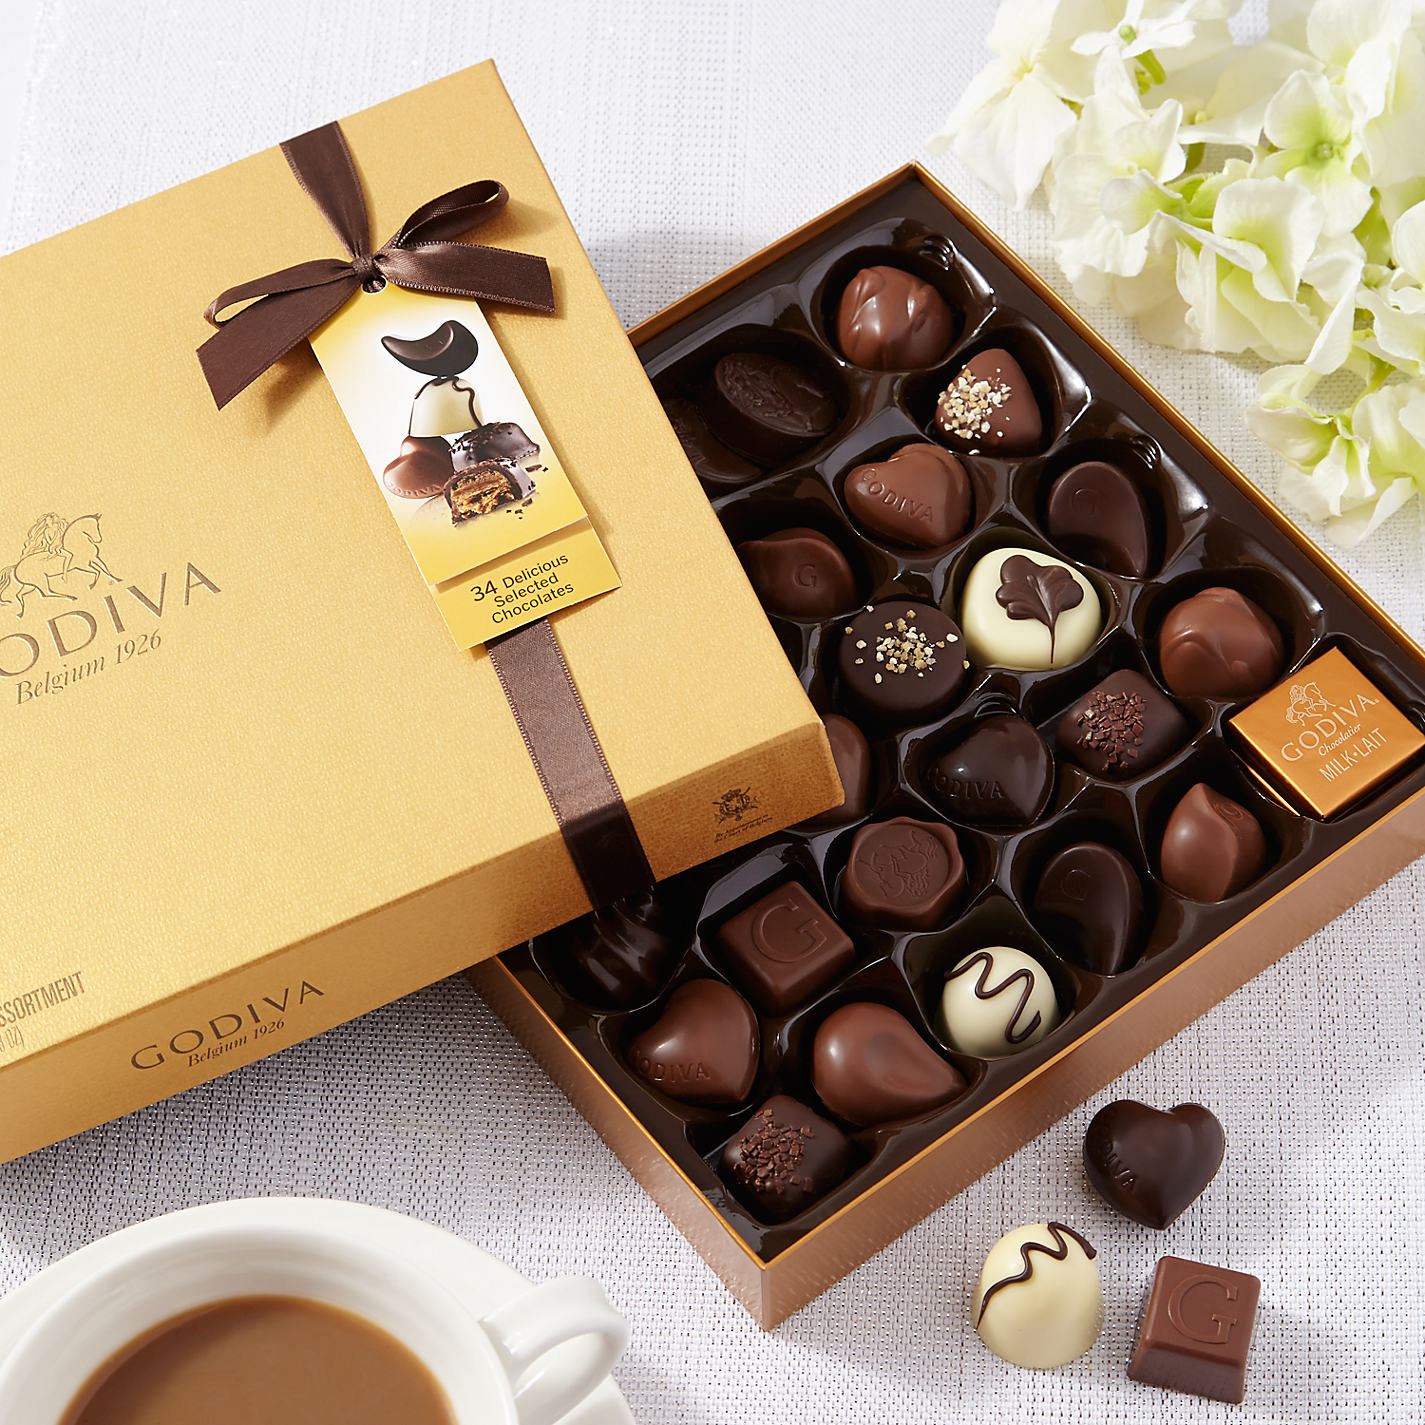 Lak-ai: World's Best Chocolate, Godiva